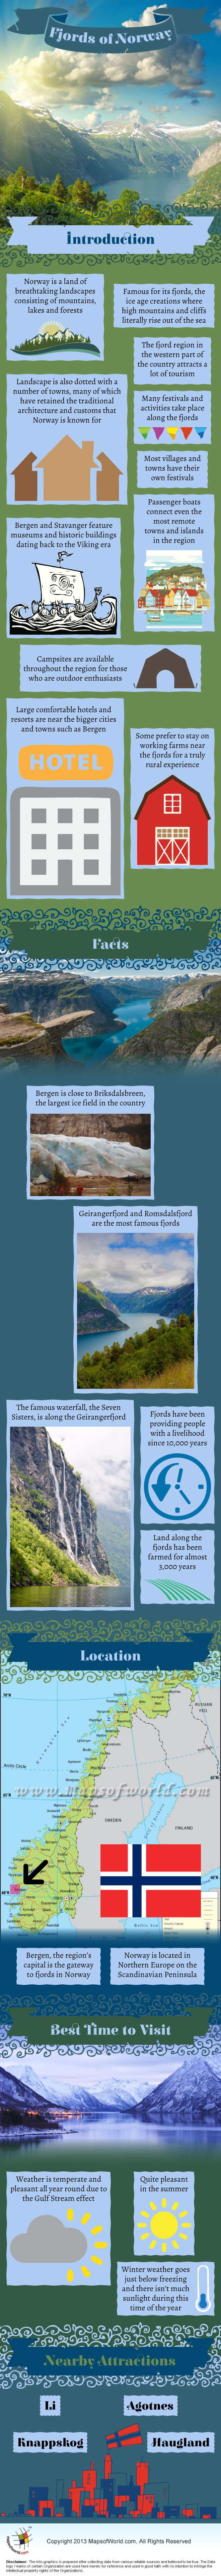 Fjords of Norway. SAIL . TRAIN . EXPLORE: Adventure Sailing www.rubicon3.co.uk